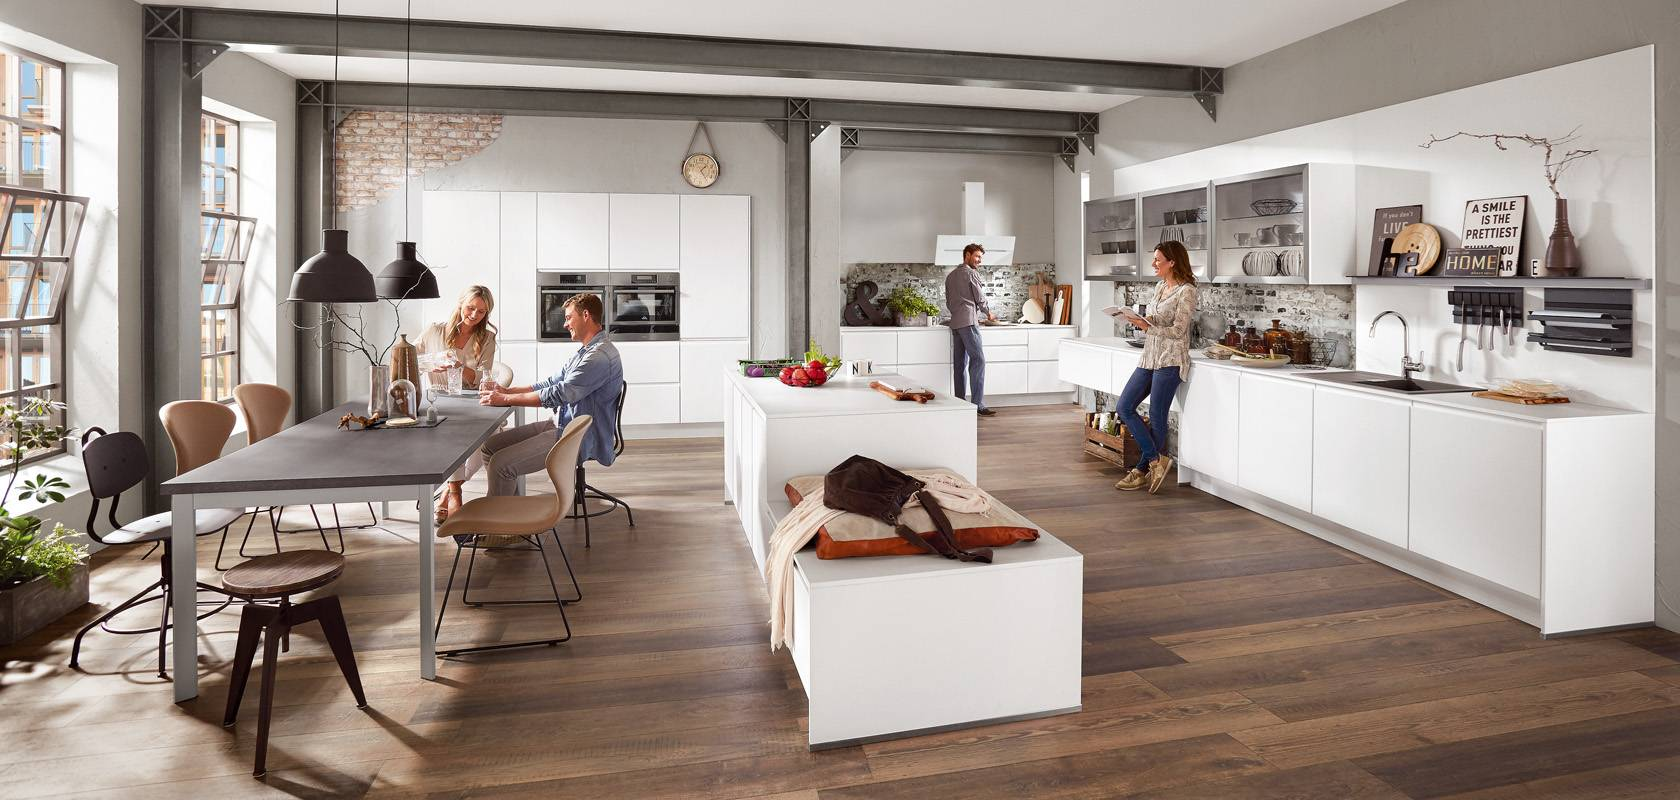 Moderno pohištvo za kuhinje, jedilnice, dnevne sobe itd.